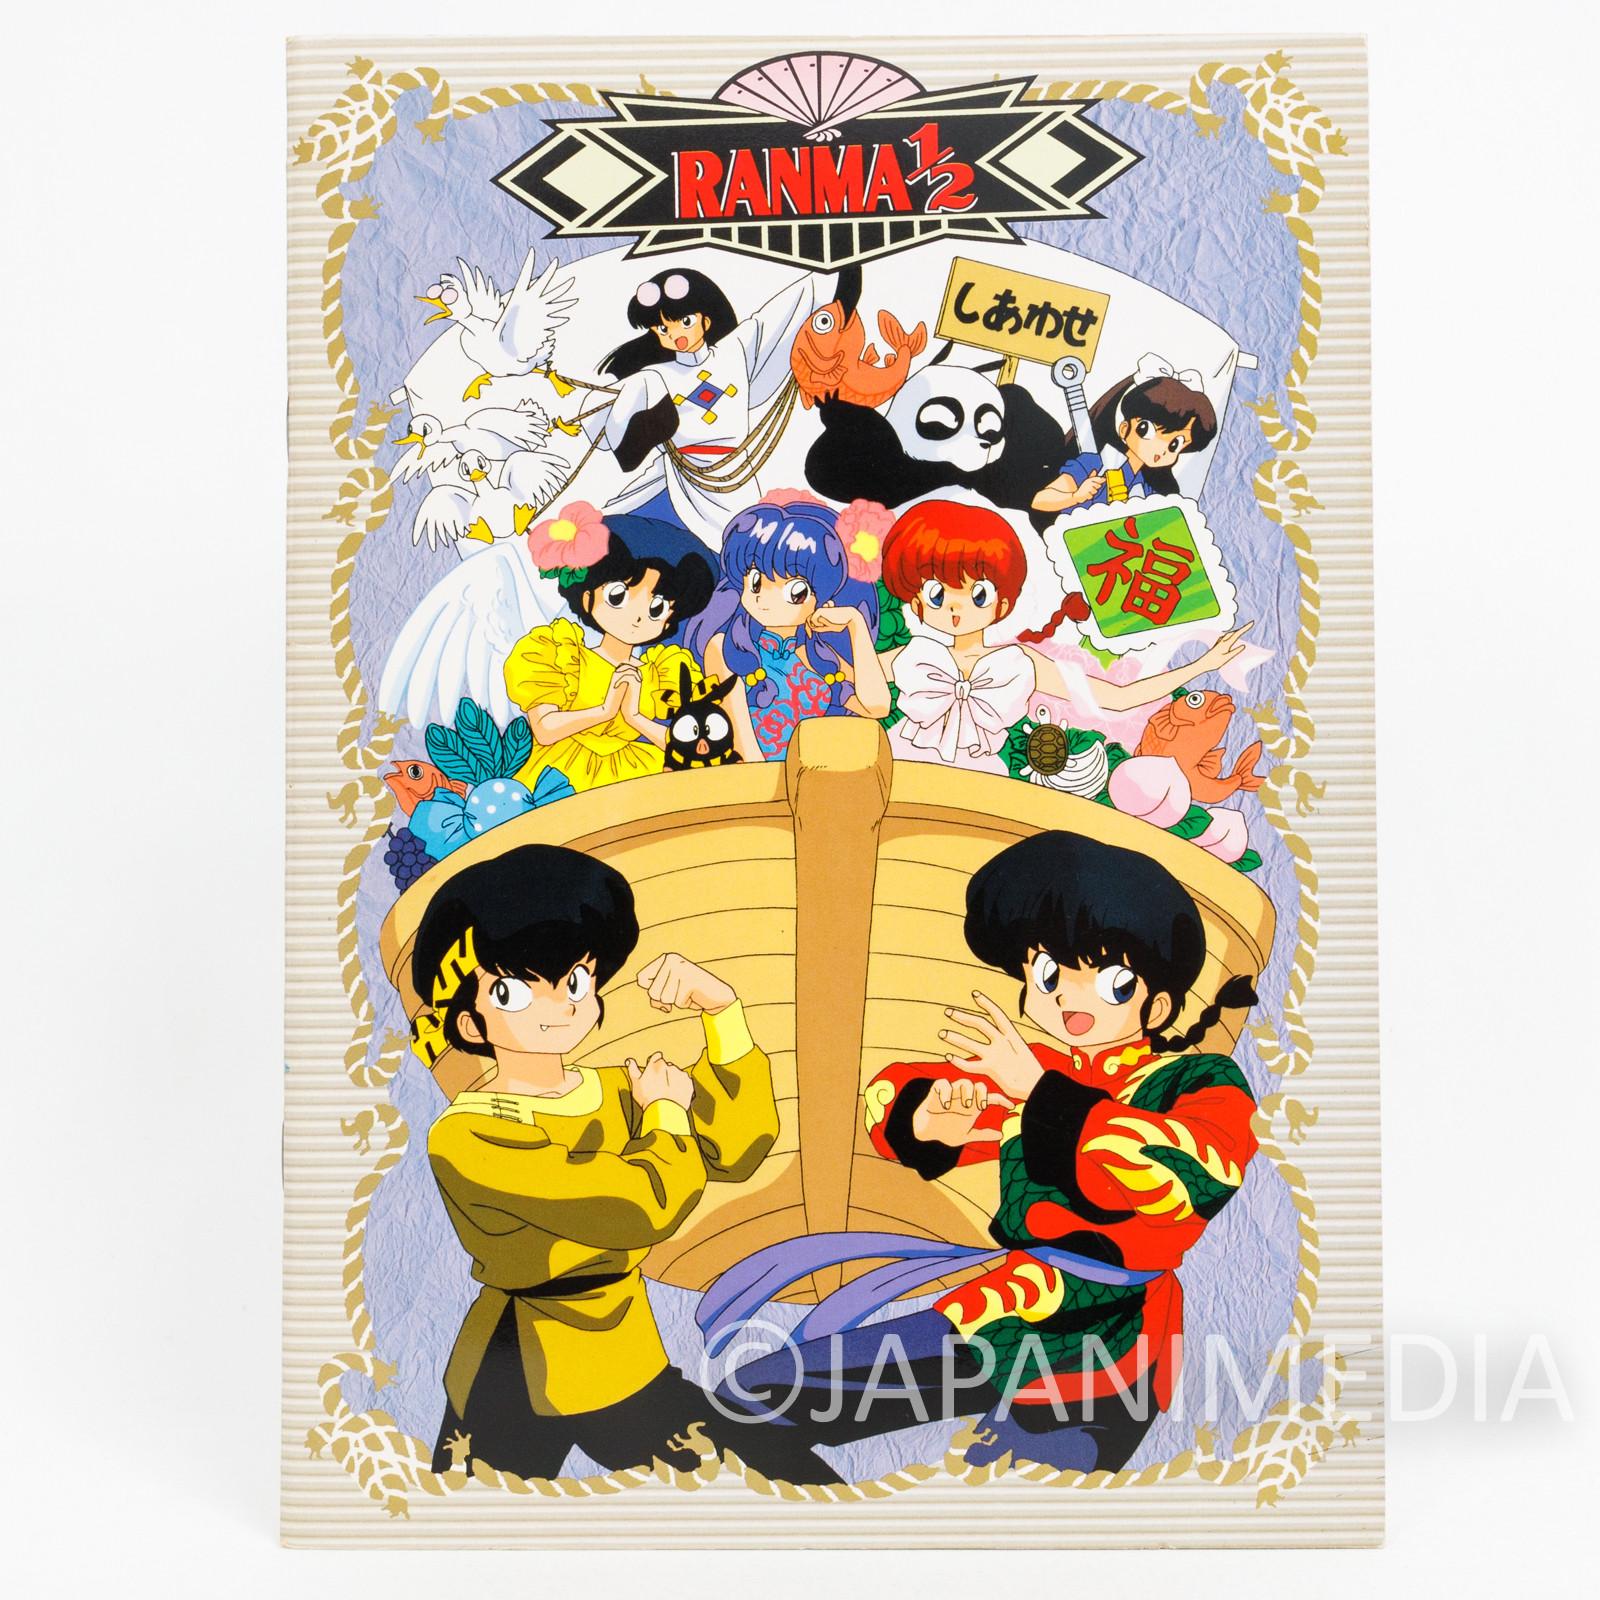 Ranma 1/2 Notebook Seika Note #5 JAPAN ANIME RUMIKO TAKAHASHI